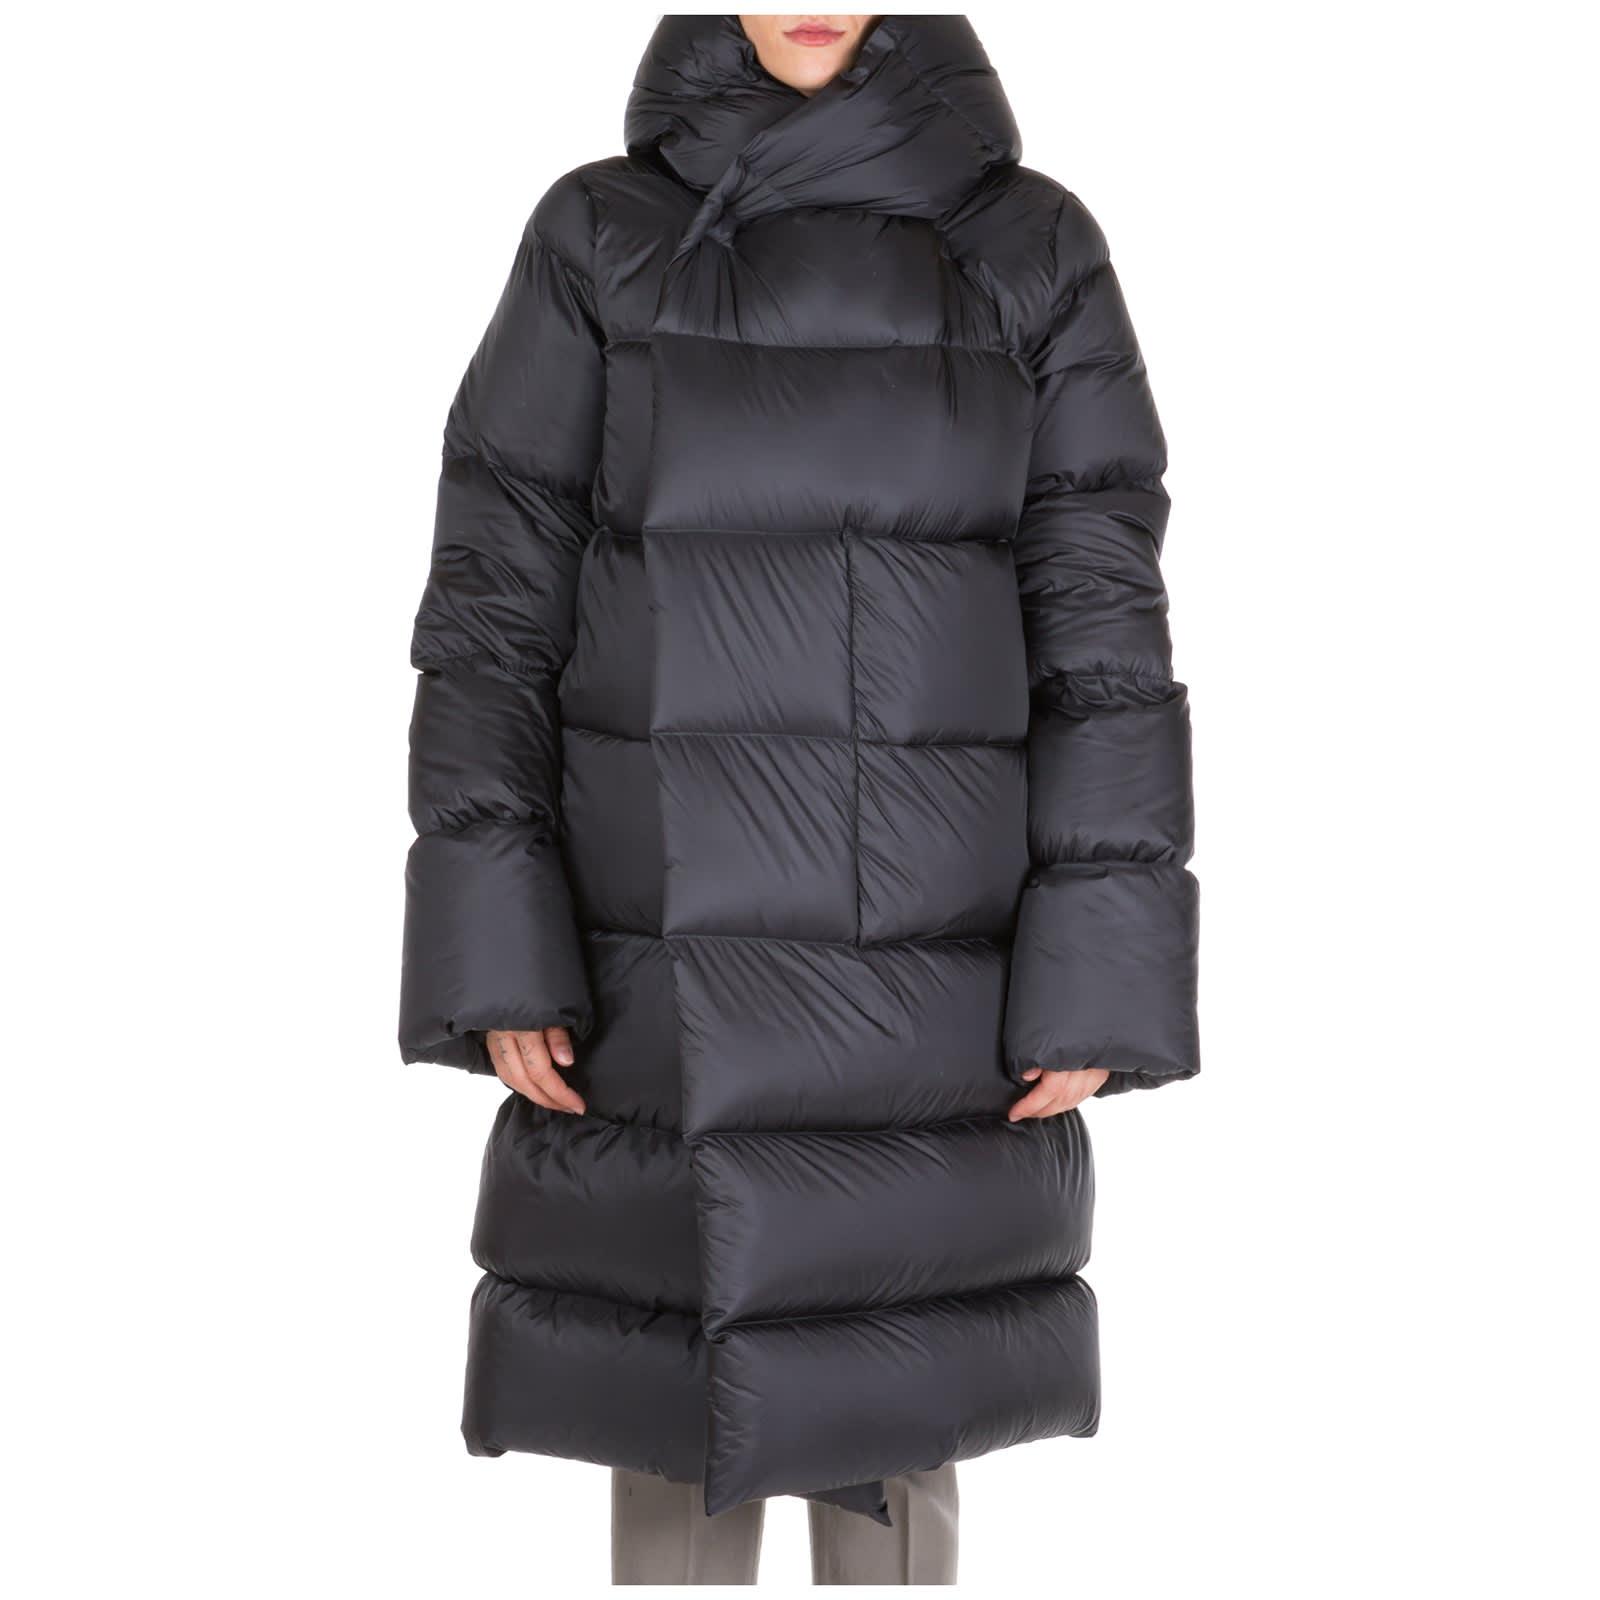 Rick Owens Outerwear Jacket Blouson Hood